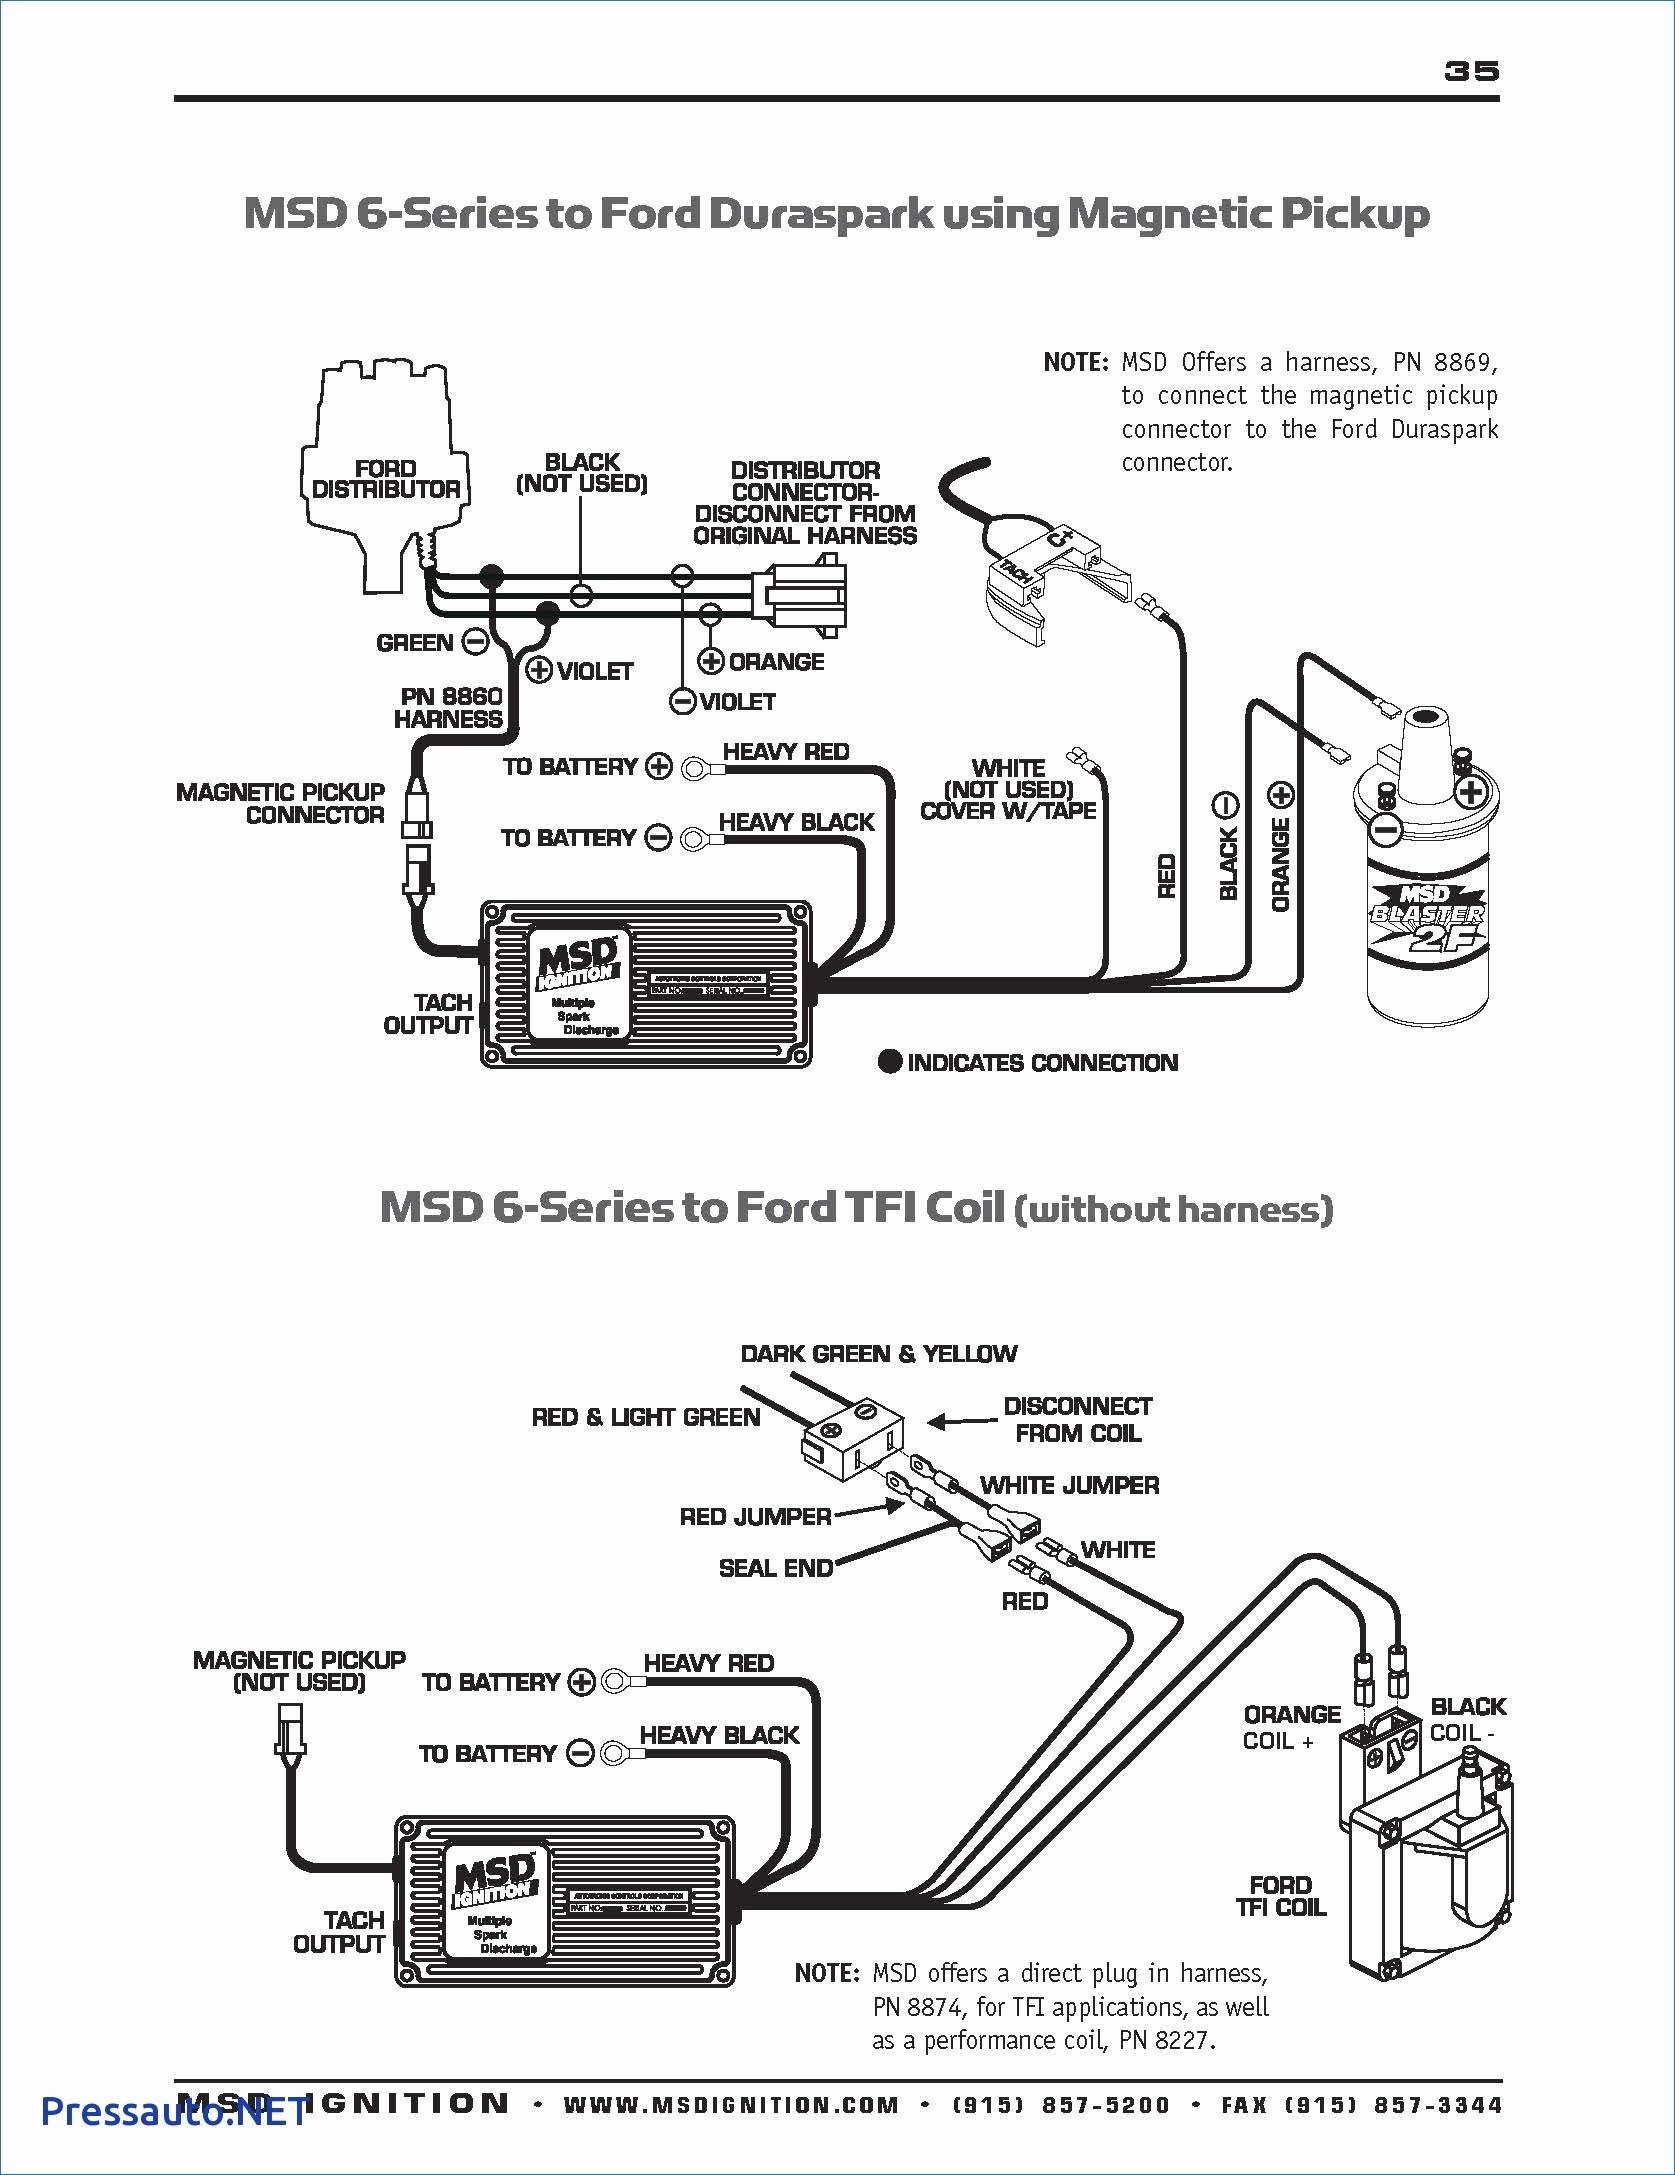 Msd Ford Wiring Diagrams 94 - Wiring Diagram K4 Ford Wiring Diagram on